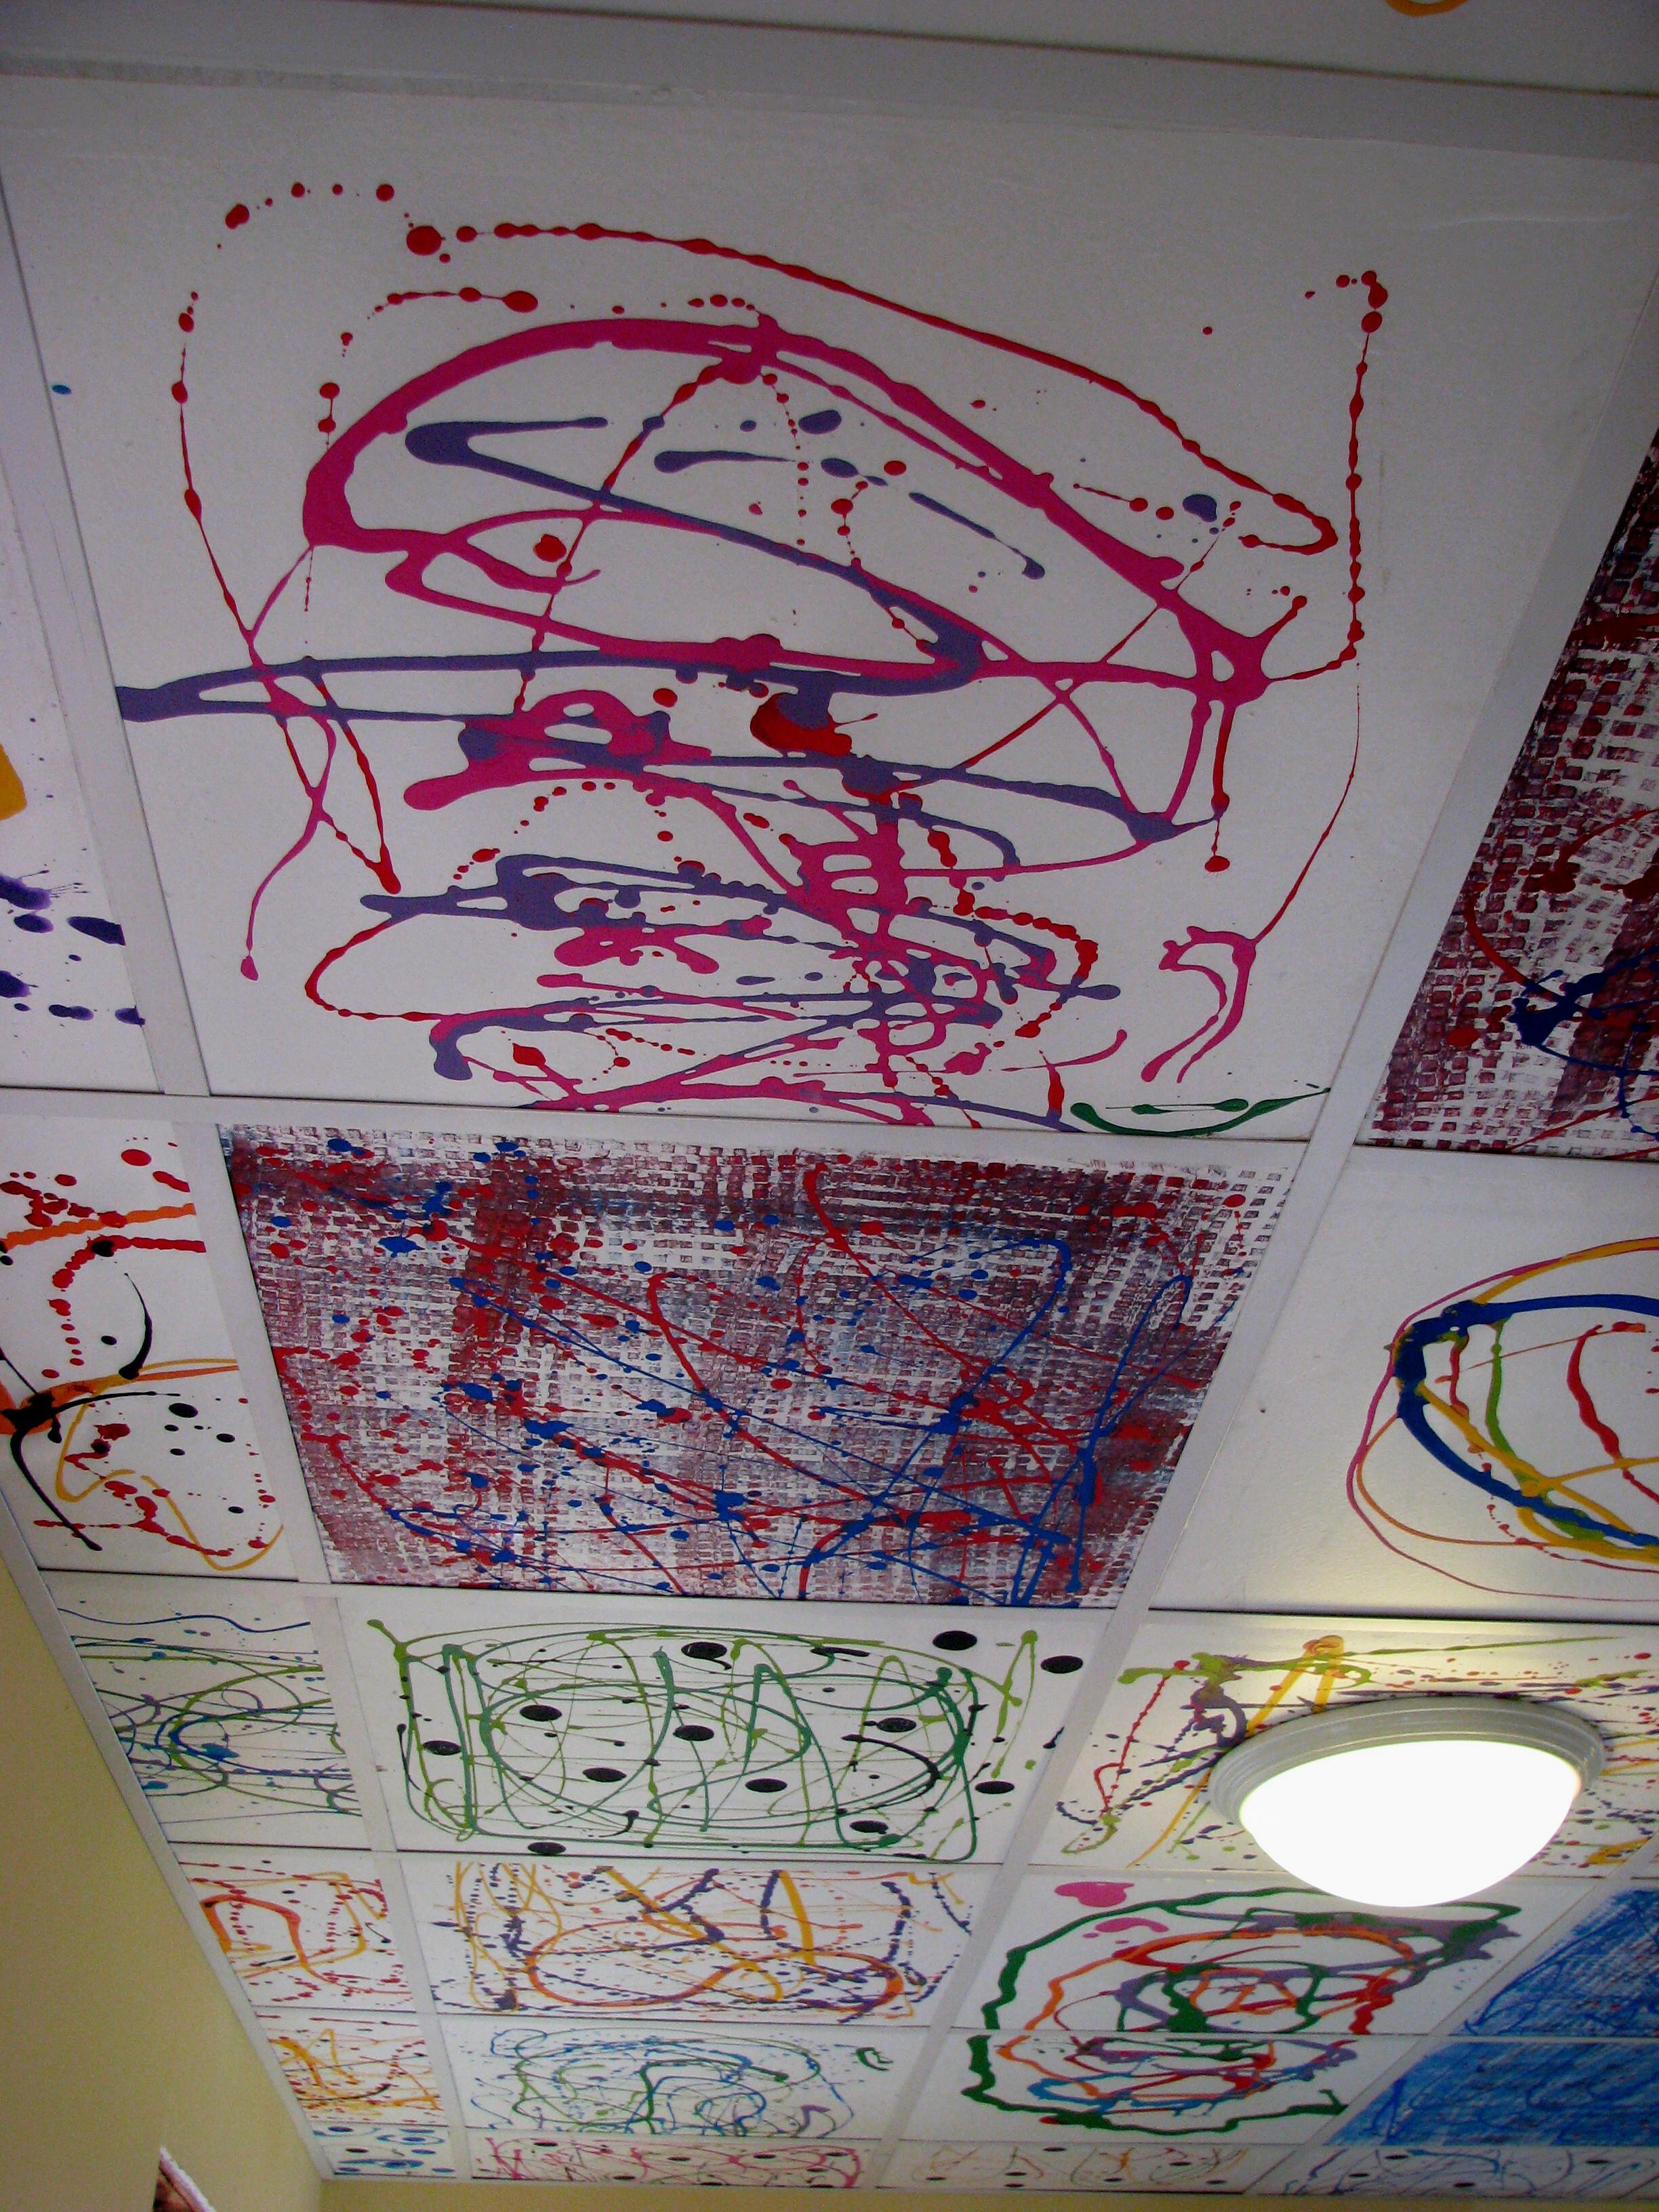 corrugated metal ceiling tiles image